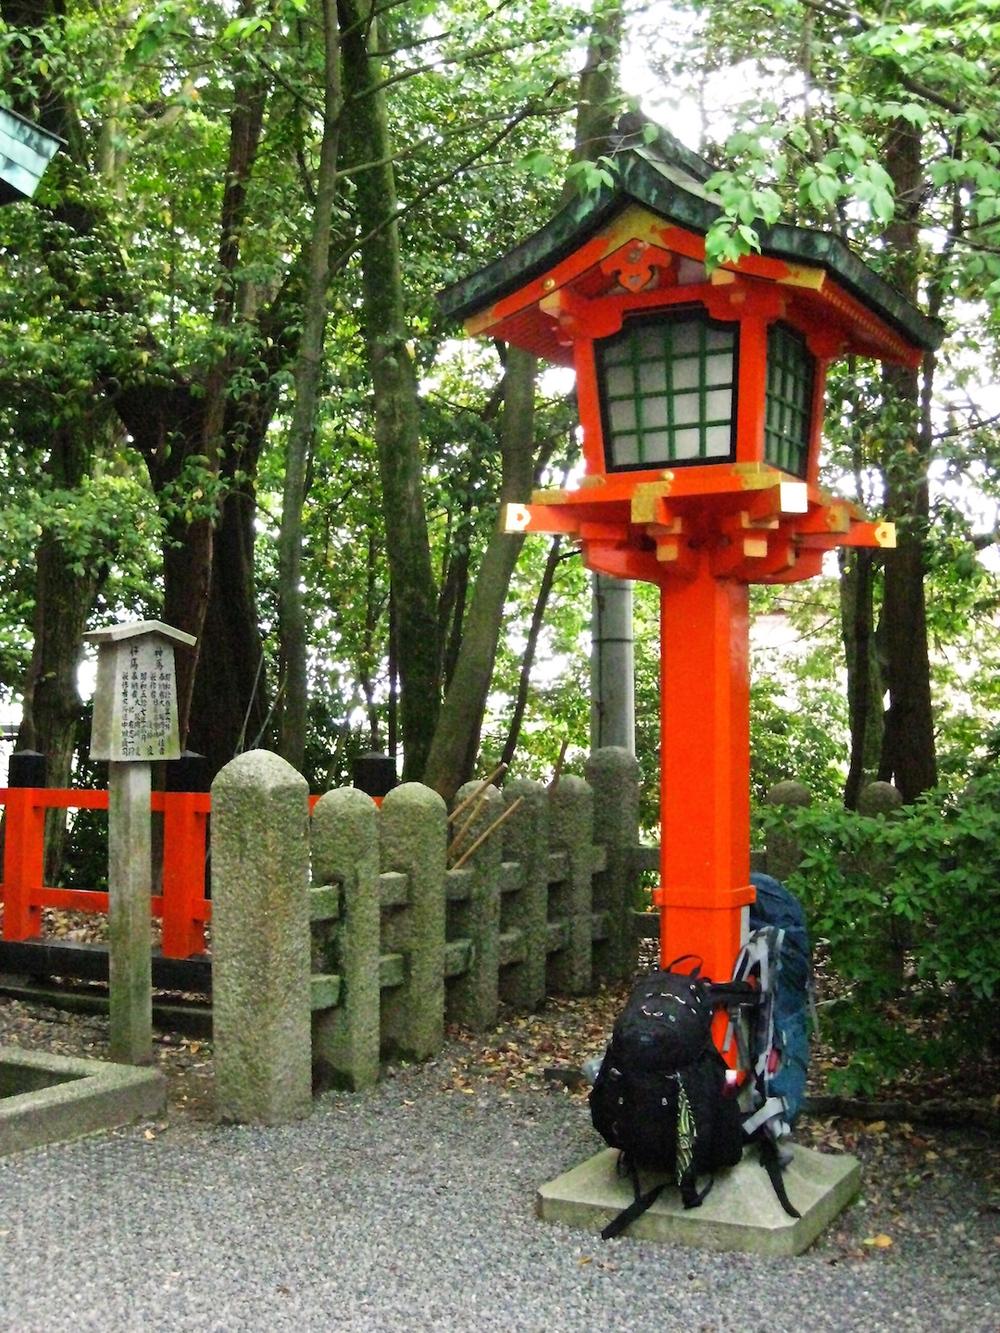 P7 Japan Wk 1 Orange Mailbox small.jpeg